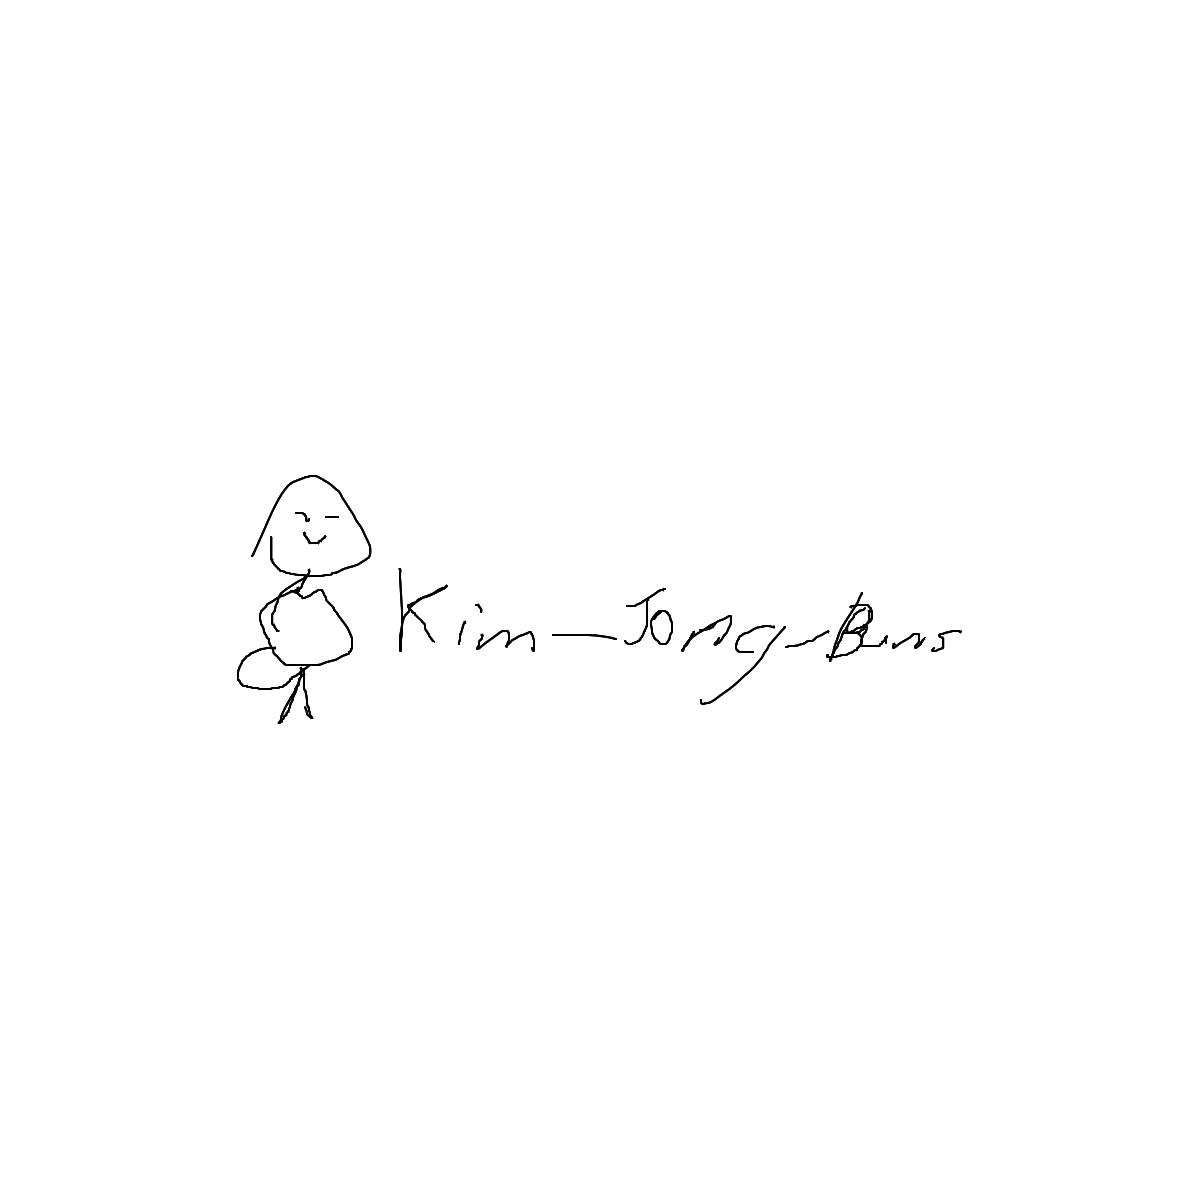 BAAAM drawing#2716 lat:39.0228576660156250lng: 125.7389984130859400